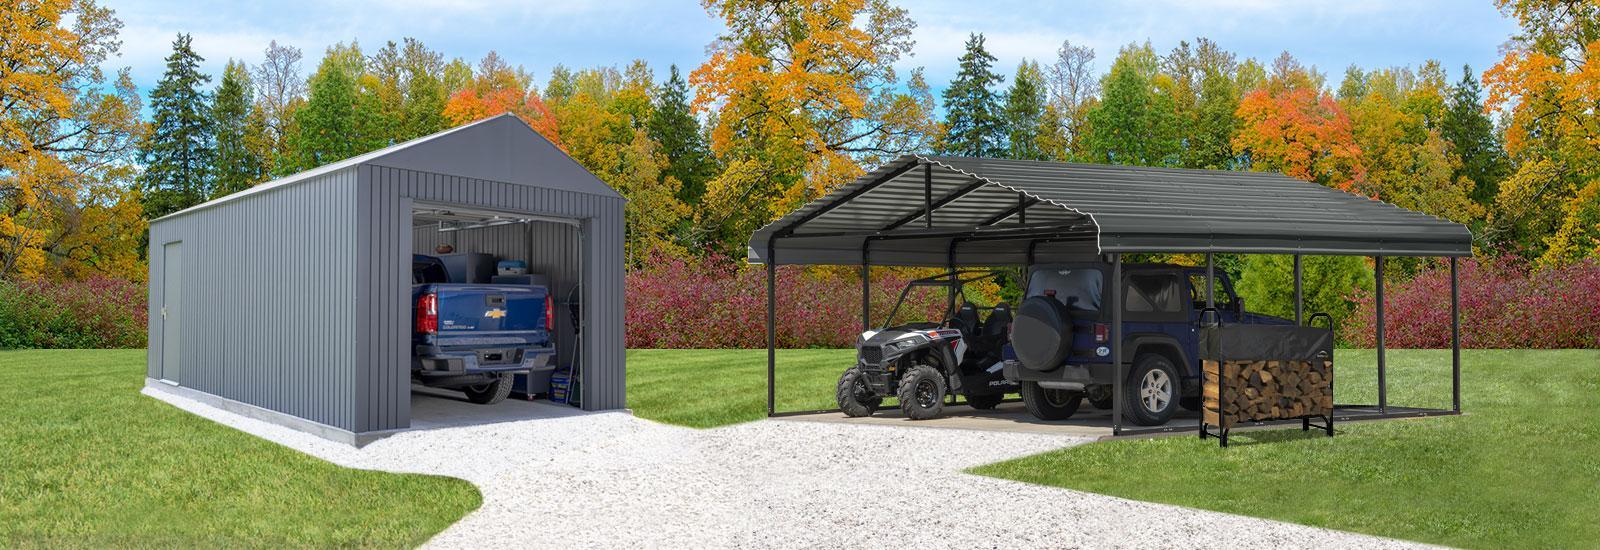 Fall Backyard Essentials Carport and Garages